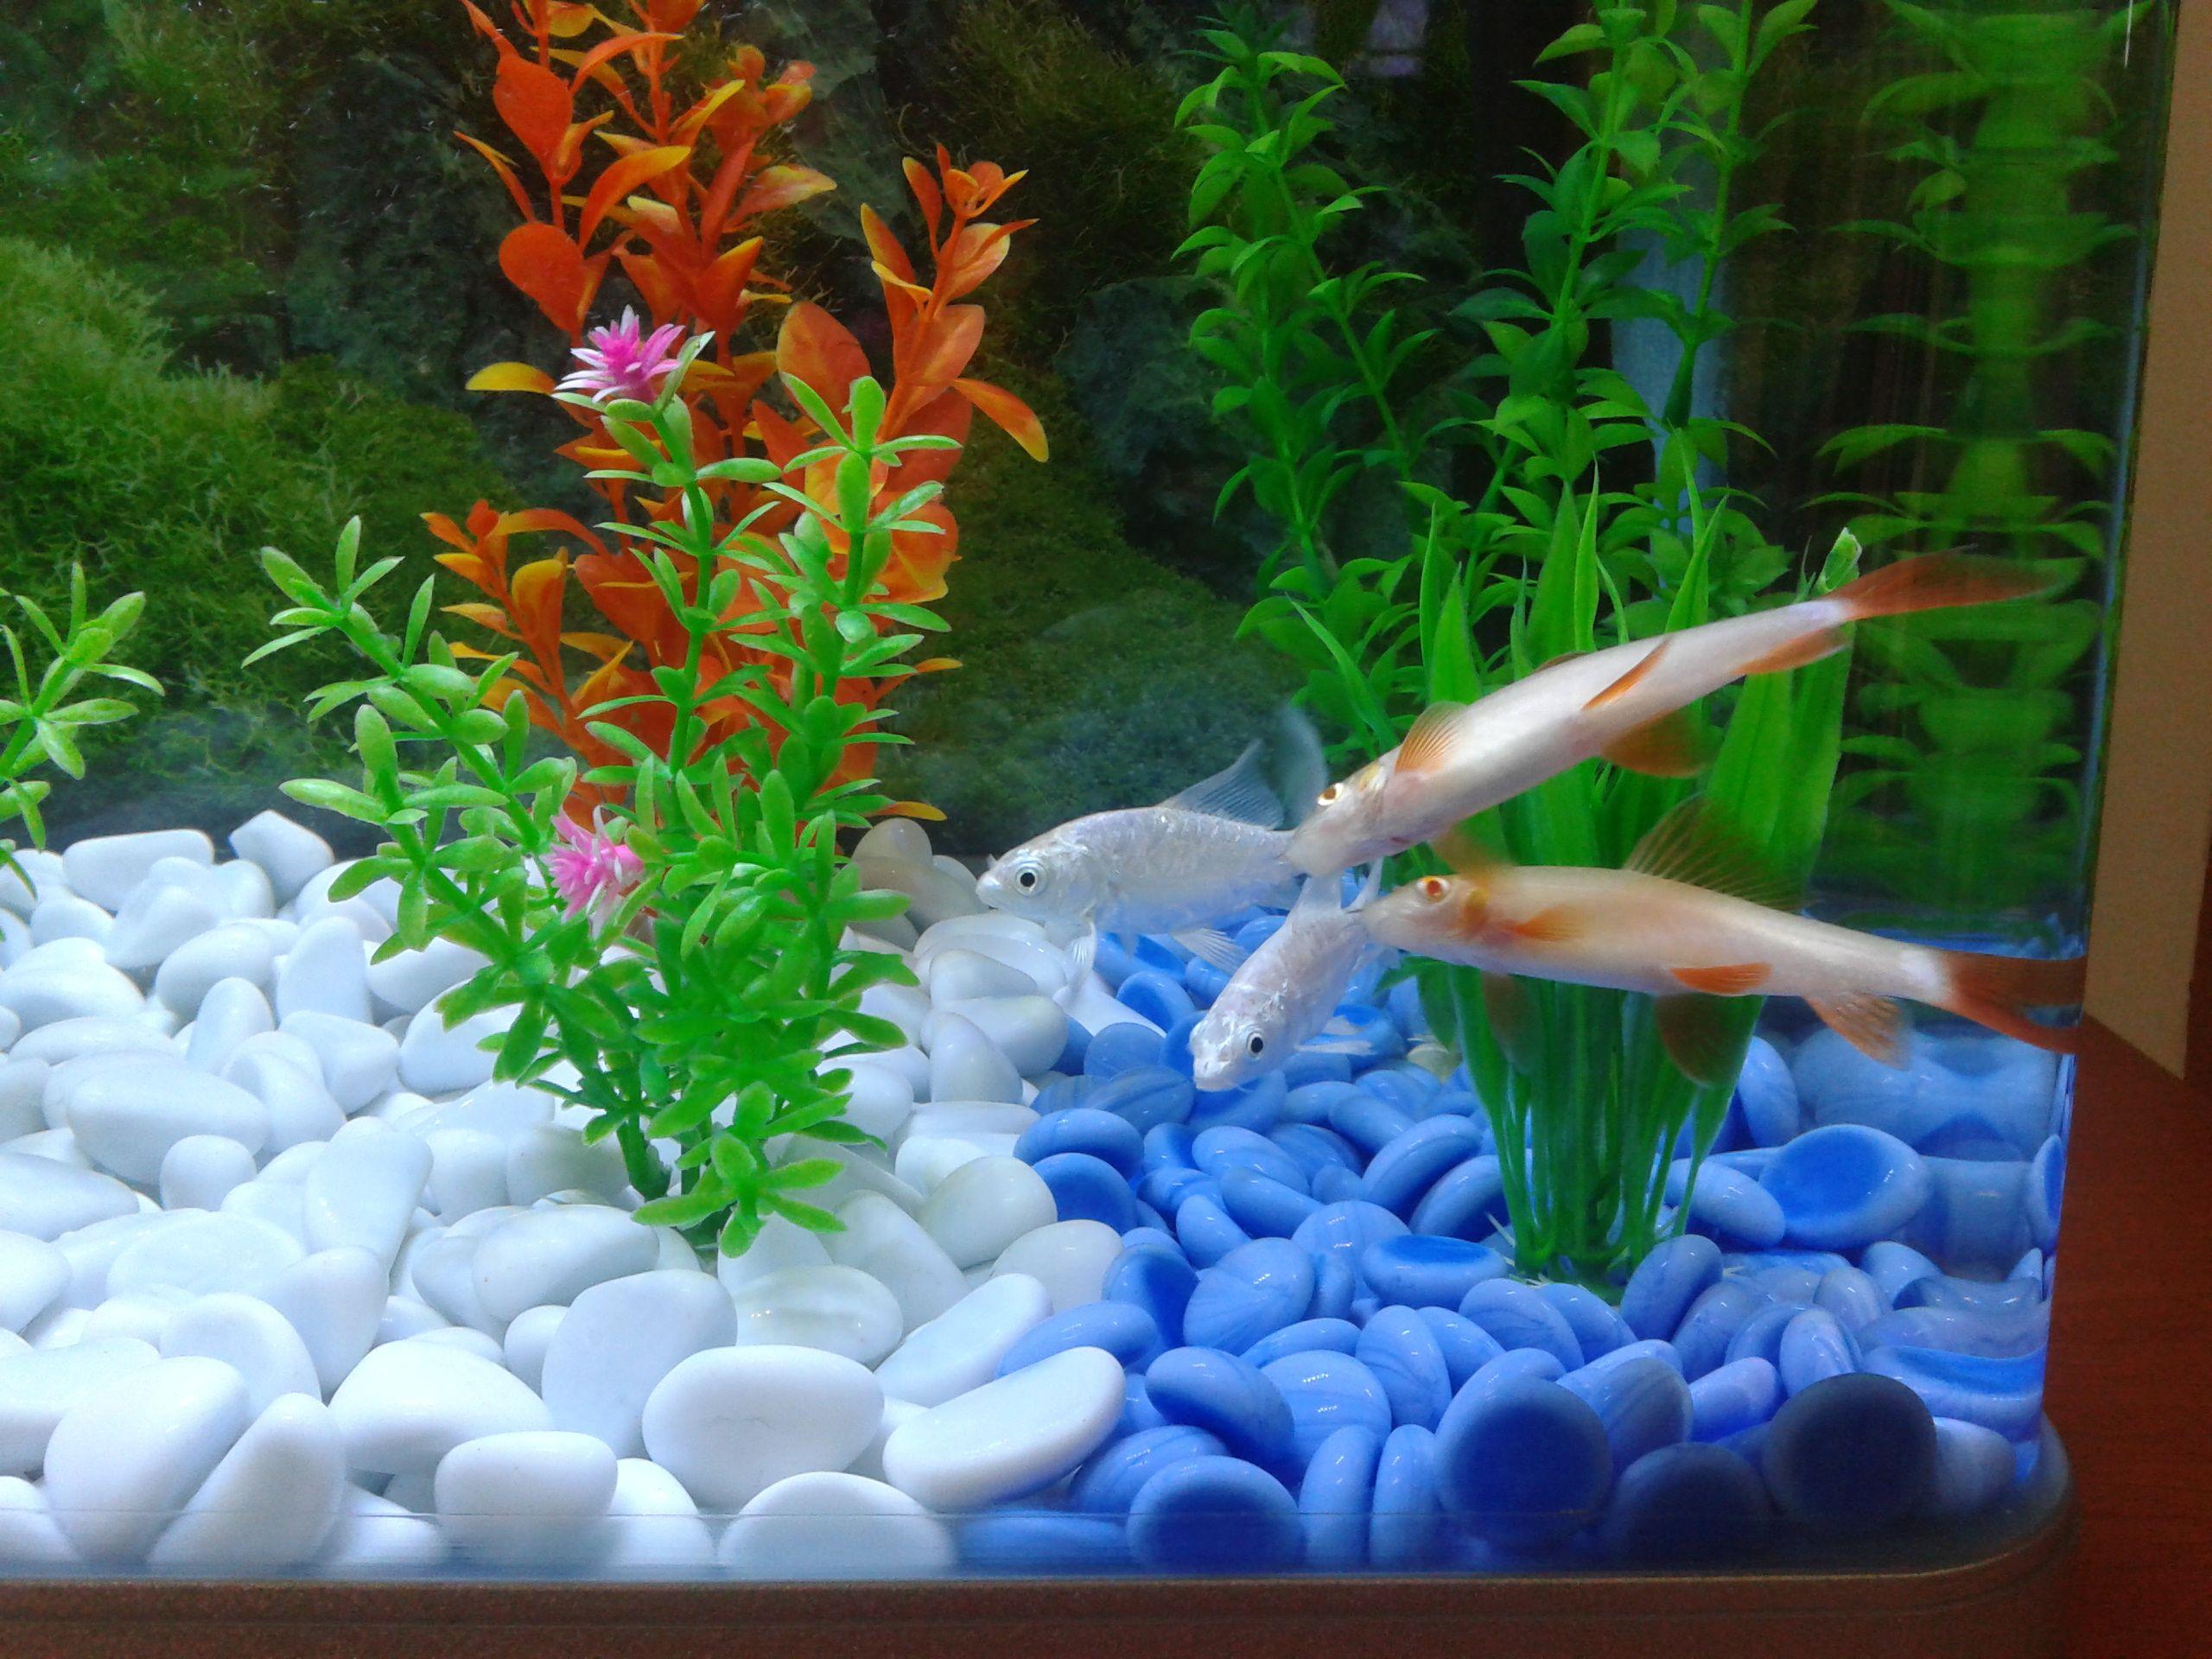 Two Albino Rainbow Sharks In A Single Tank Big Mistake Single Tank Plants Photography